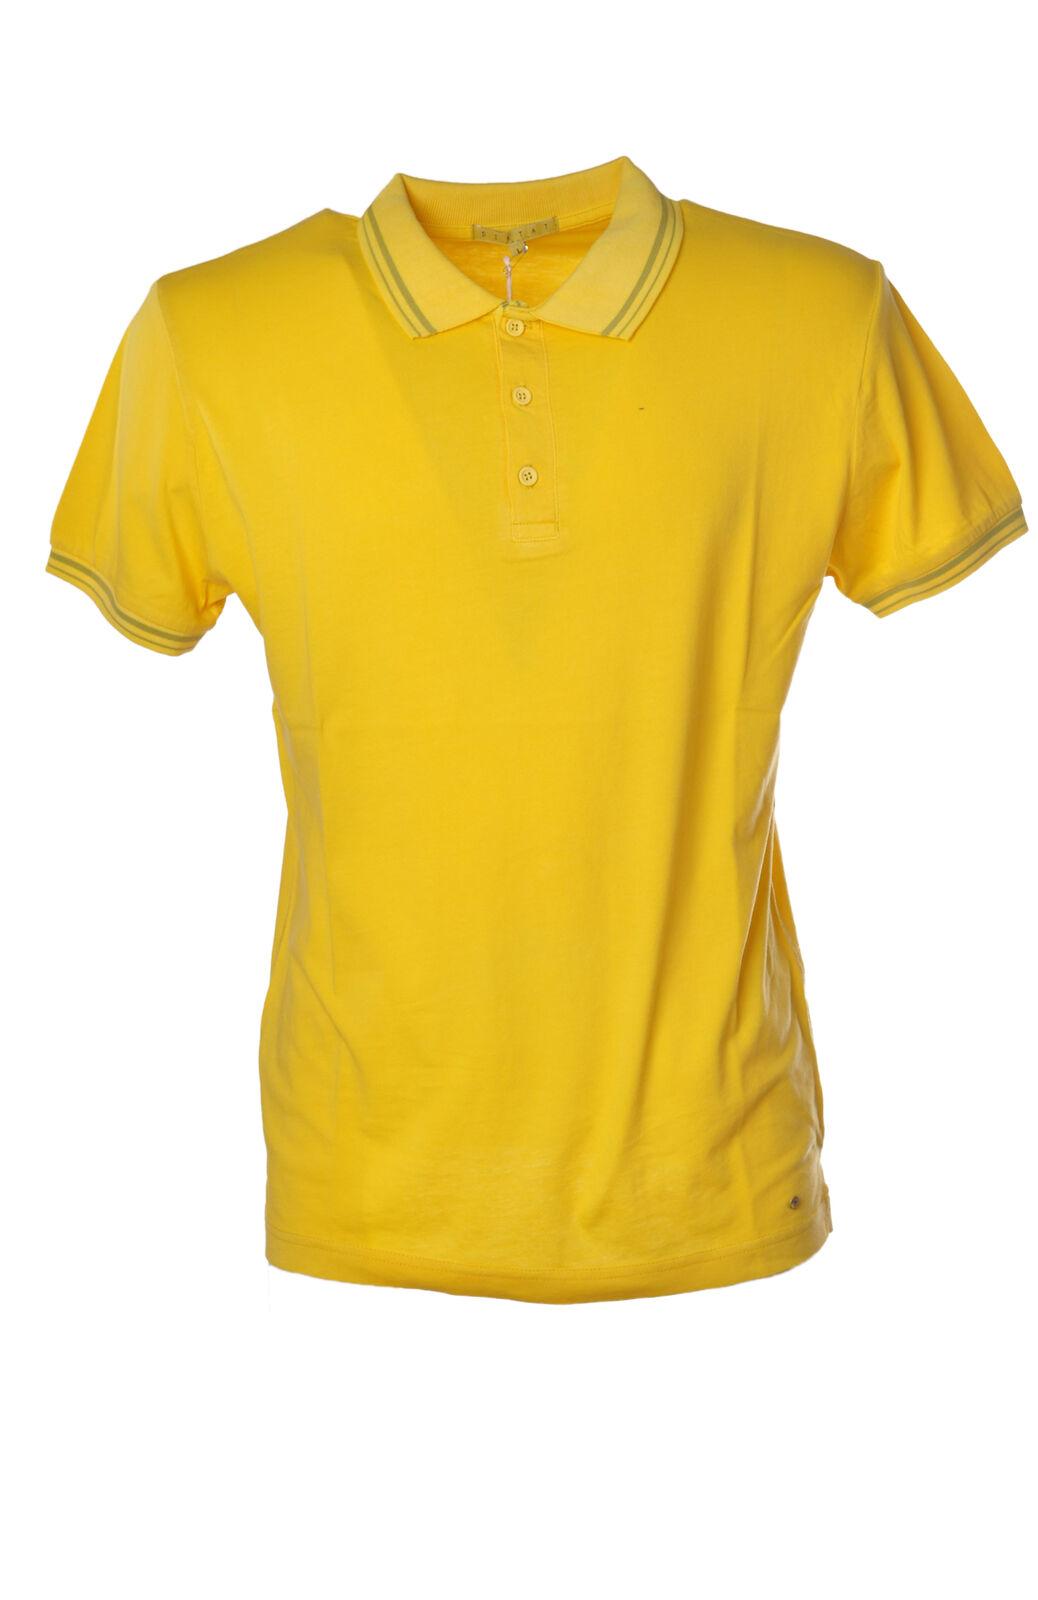 Diktat  -  Polo - Male - Yellow - 1804125N174258